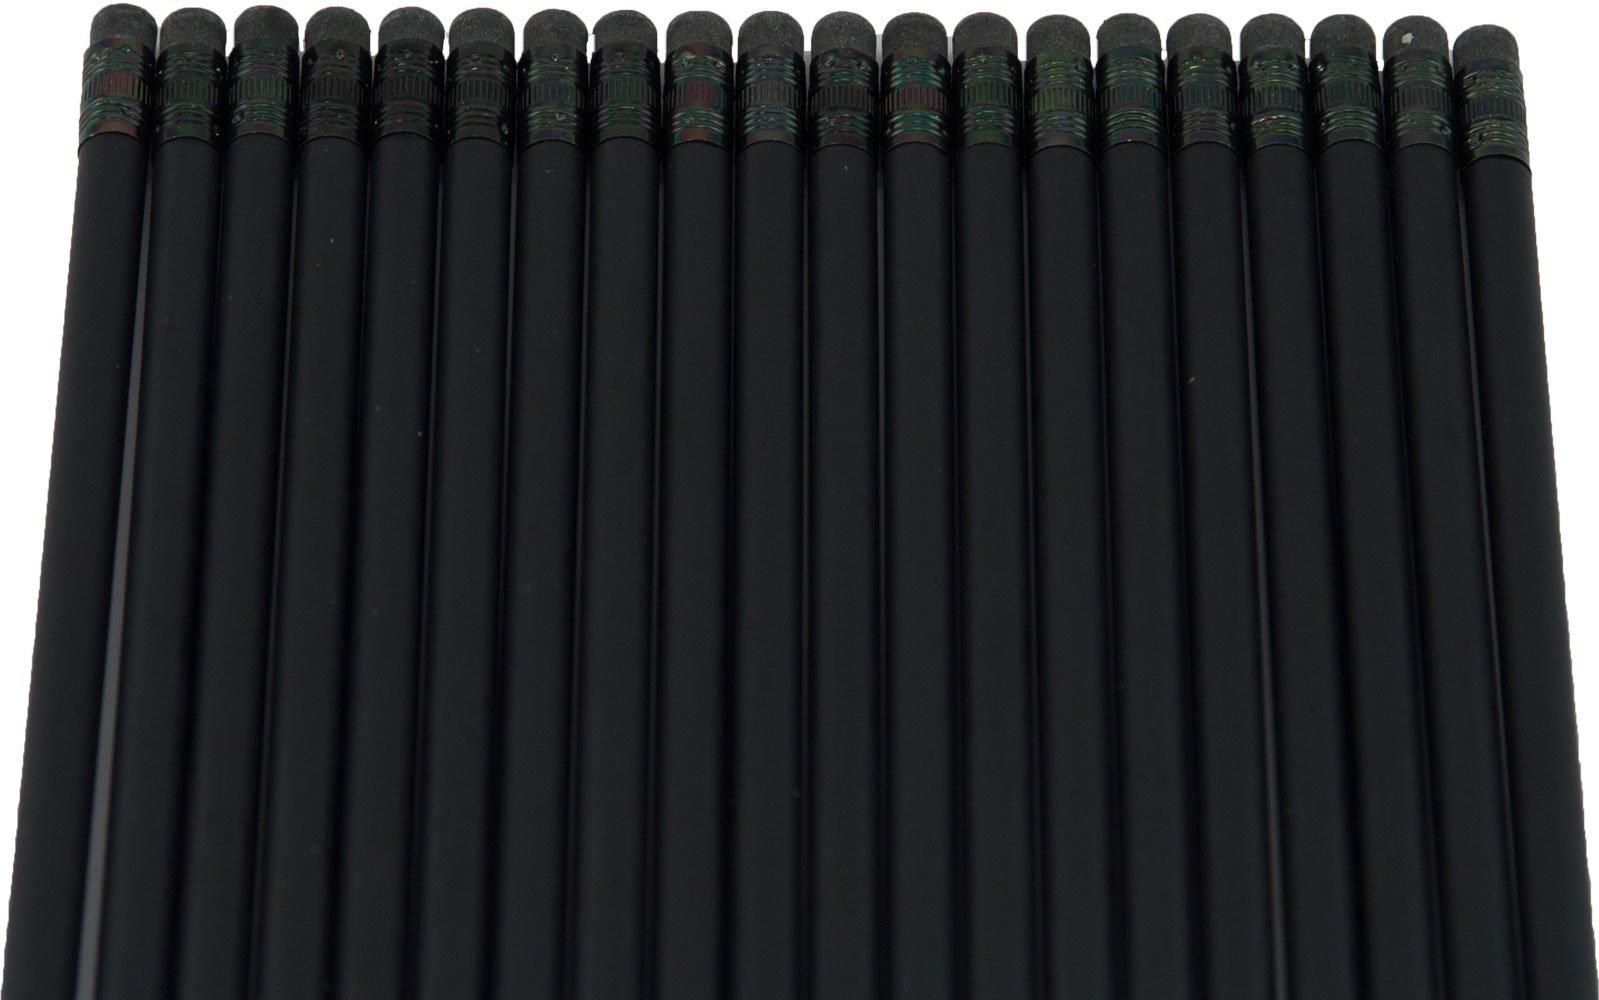 Ultra Premium Matte Black Pencil (Black Wood Matte Black with Black Eraser)(#2HB Lead) (Matte Black)(Bag of 36) by Graphite Pen & Pencil Company (Image #2)